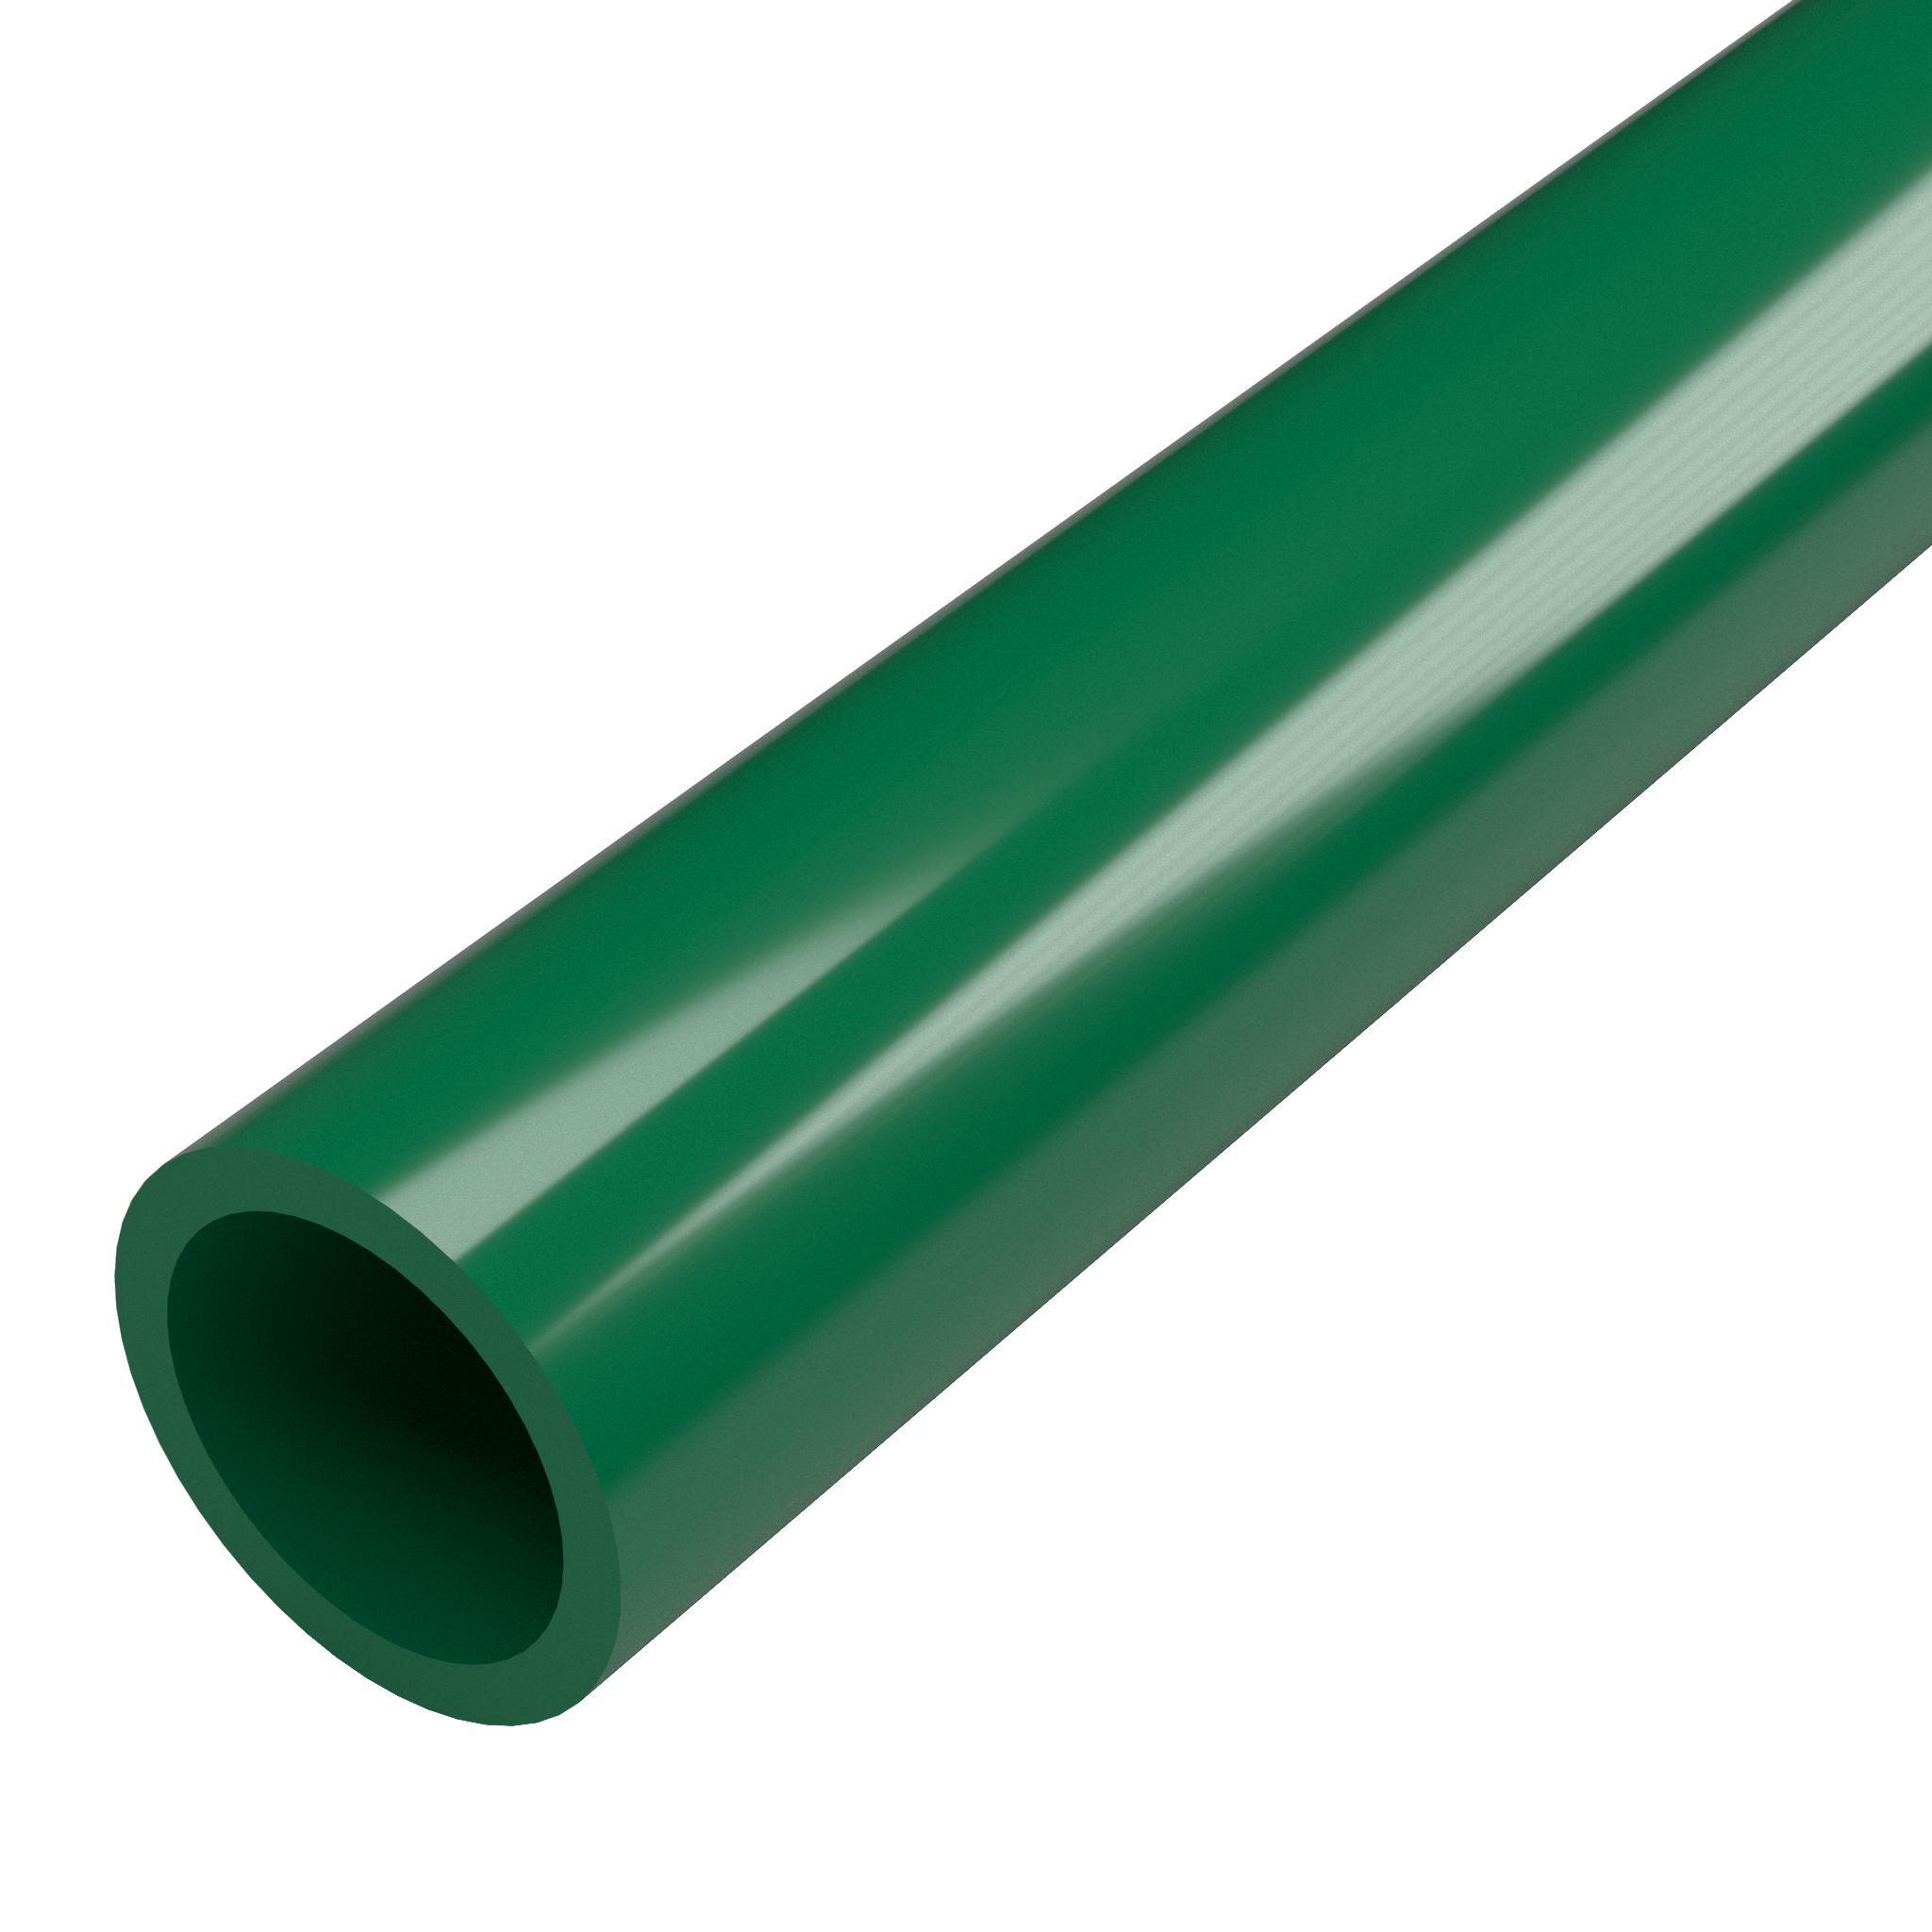 "FORMUFIT P001FGP-GR-5 Schedule 40 PVC Pipe, Furniture Grade, 5-Feet, 1"" Size, Green"